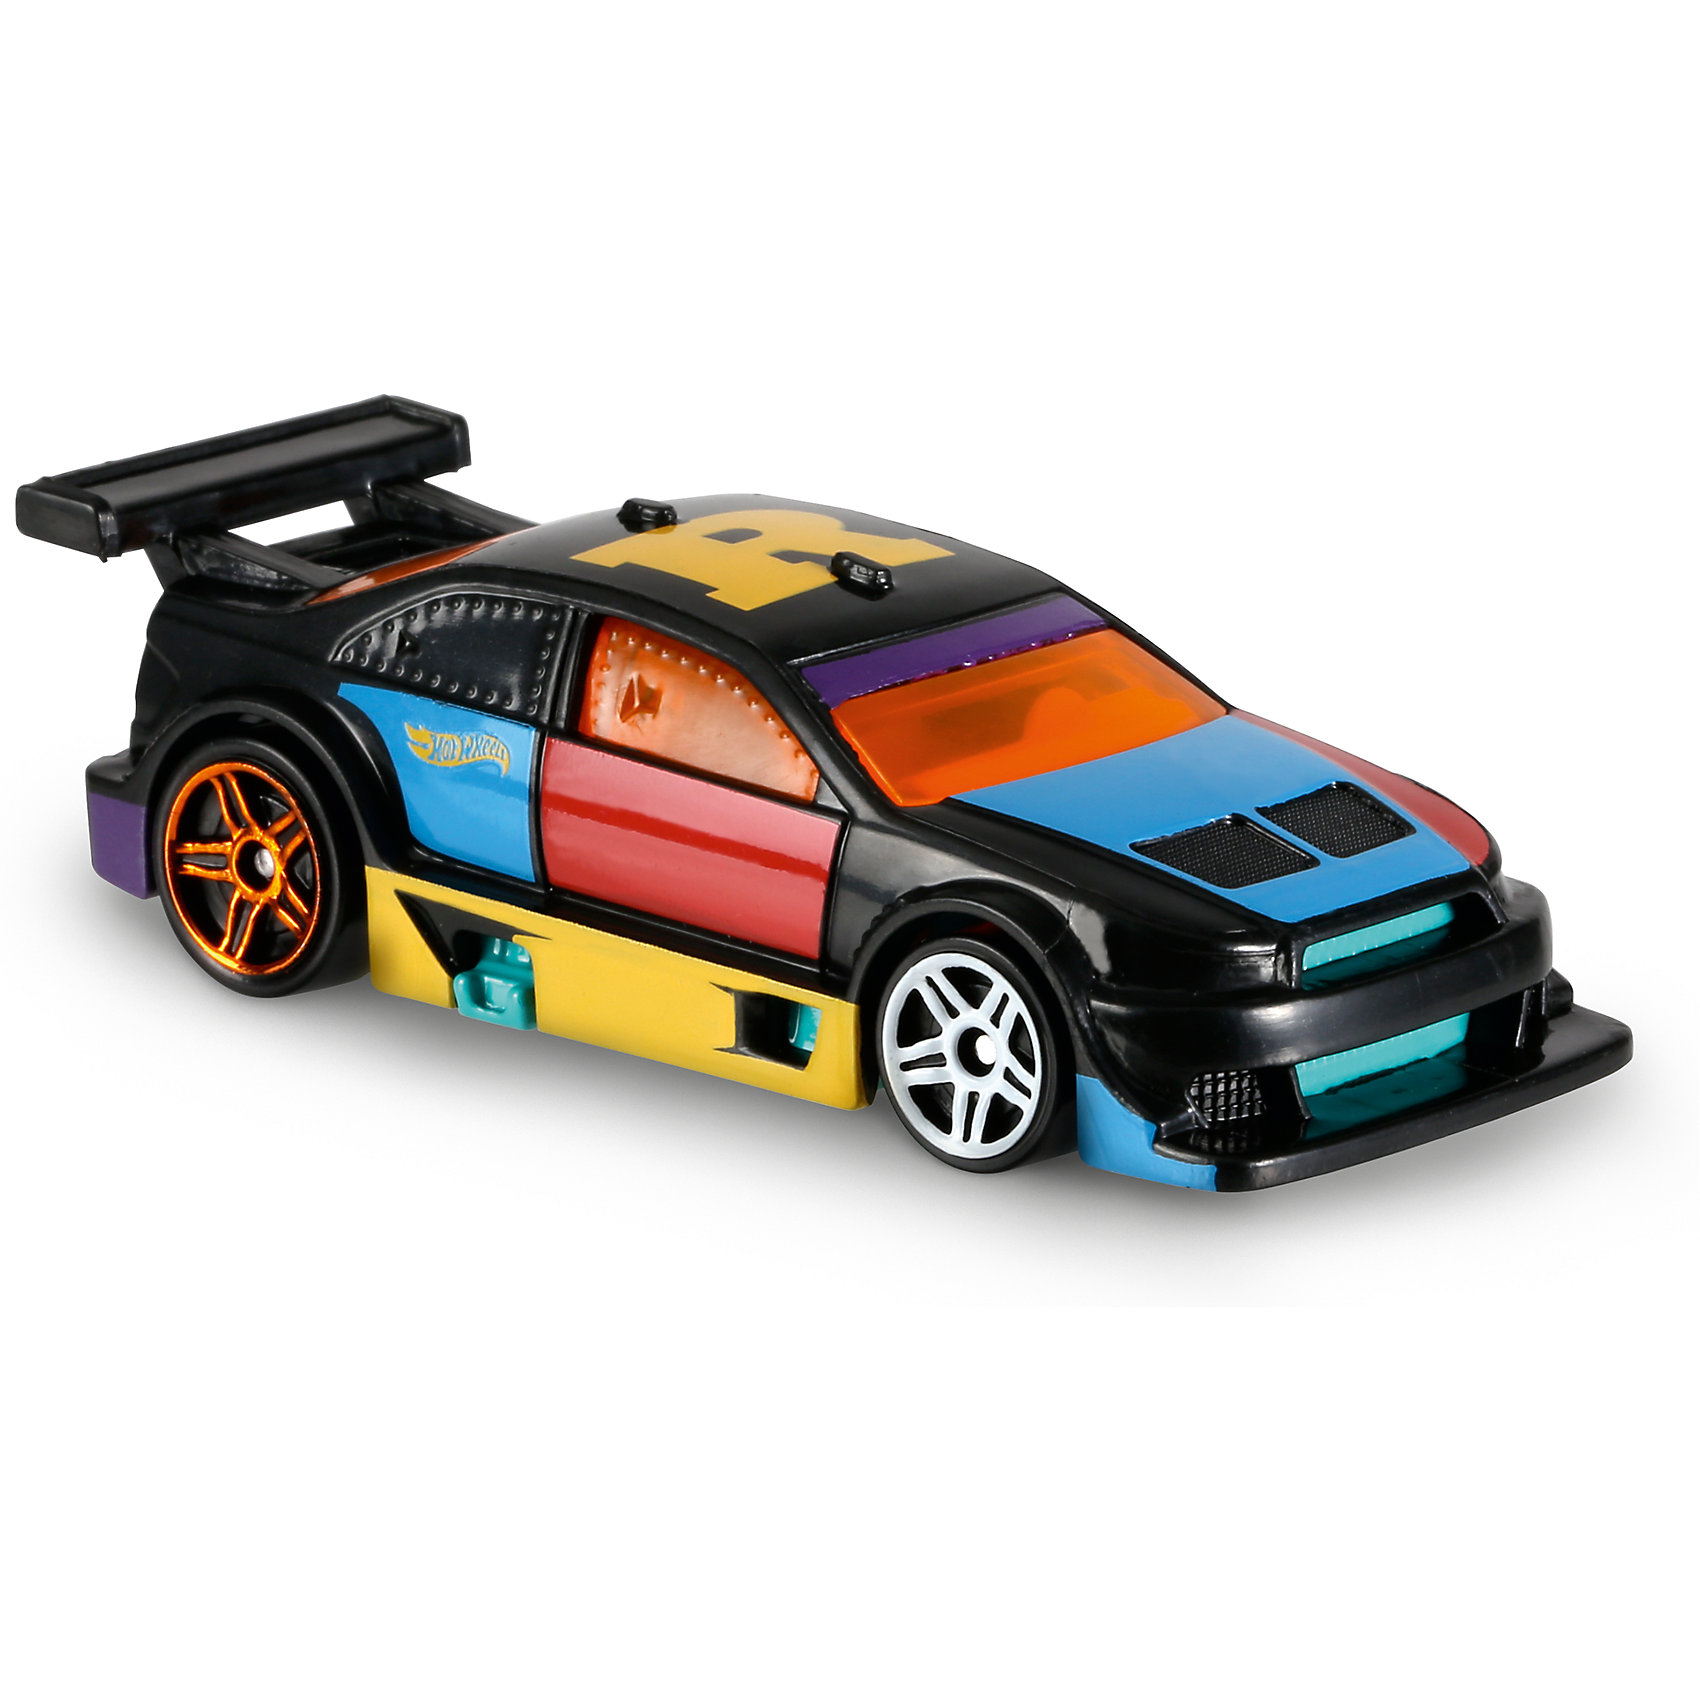 Базовая машинка Hot Wheels, AmazoomПопулярные игрушки<br><br><br>Ширина мм: 110<br>Глубина мм: 45<br>Высота мм: 110<br>Вес г: 30<br>Возраст от месяцев: 36<br>Возраст до месяцев: 96<br>Пол: Мужской<br>Возраст: Детский<br>SKU: 7111072